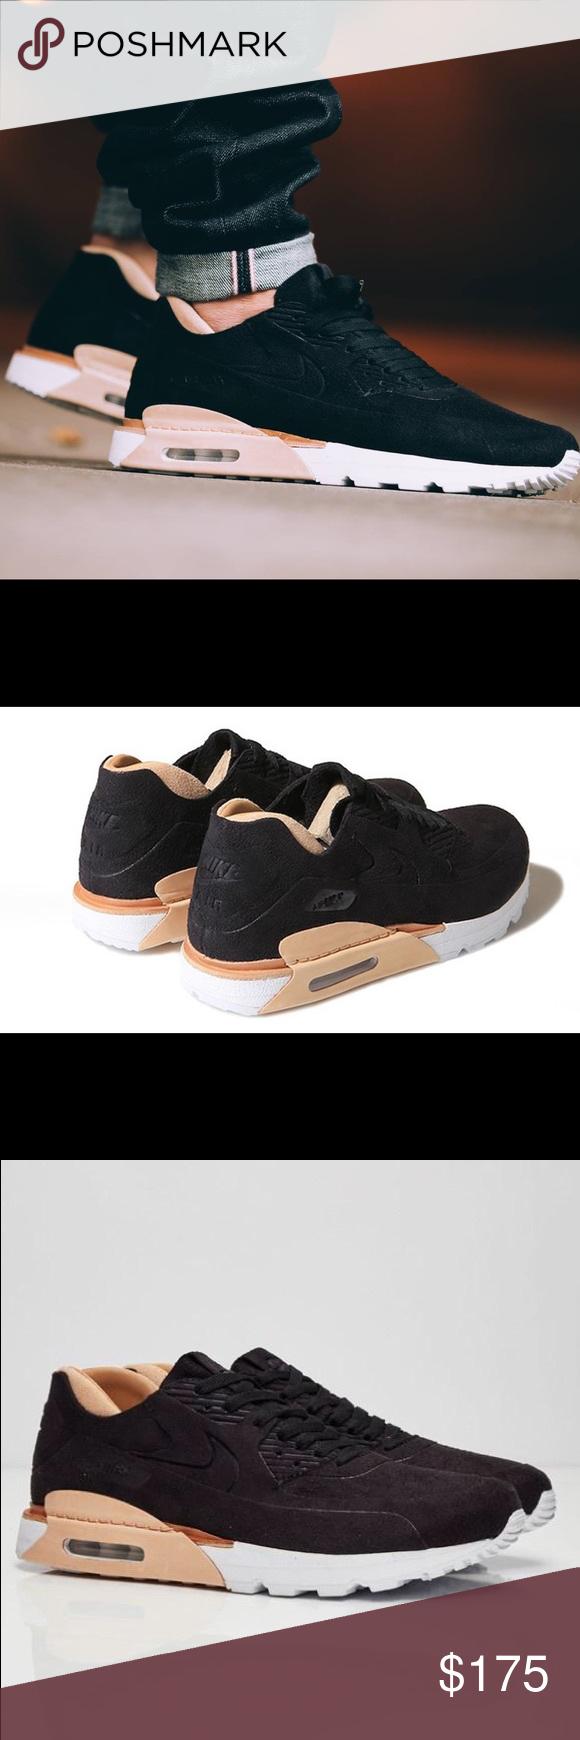 187eebf84f Spotted while shopping on Poshmark: NIKE AIR MAX 90 ROYAL BLACK TAN NIKE  LAB SHOES! #poshmark #fashion #shopping #style #Nike #Other